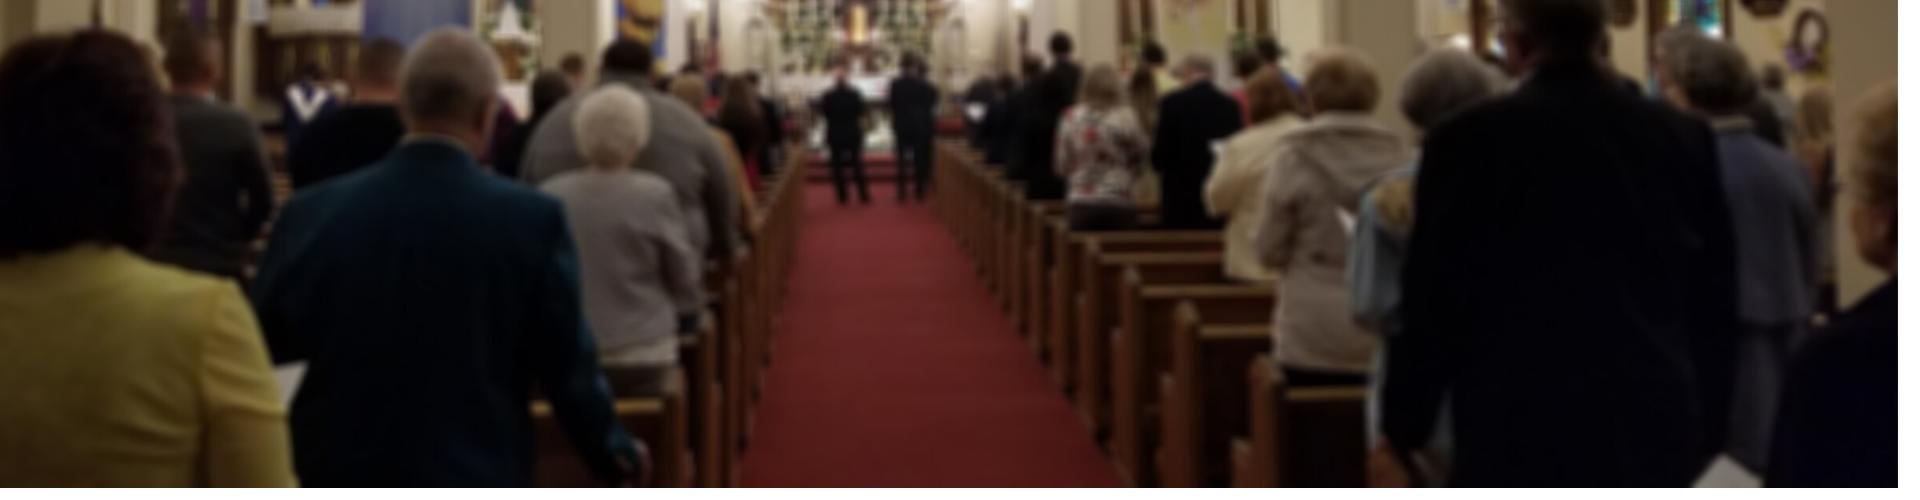 Polish National Catholic Church Events